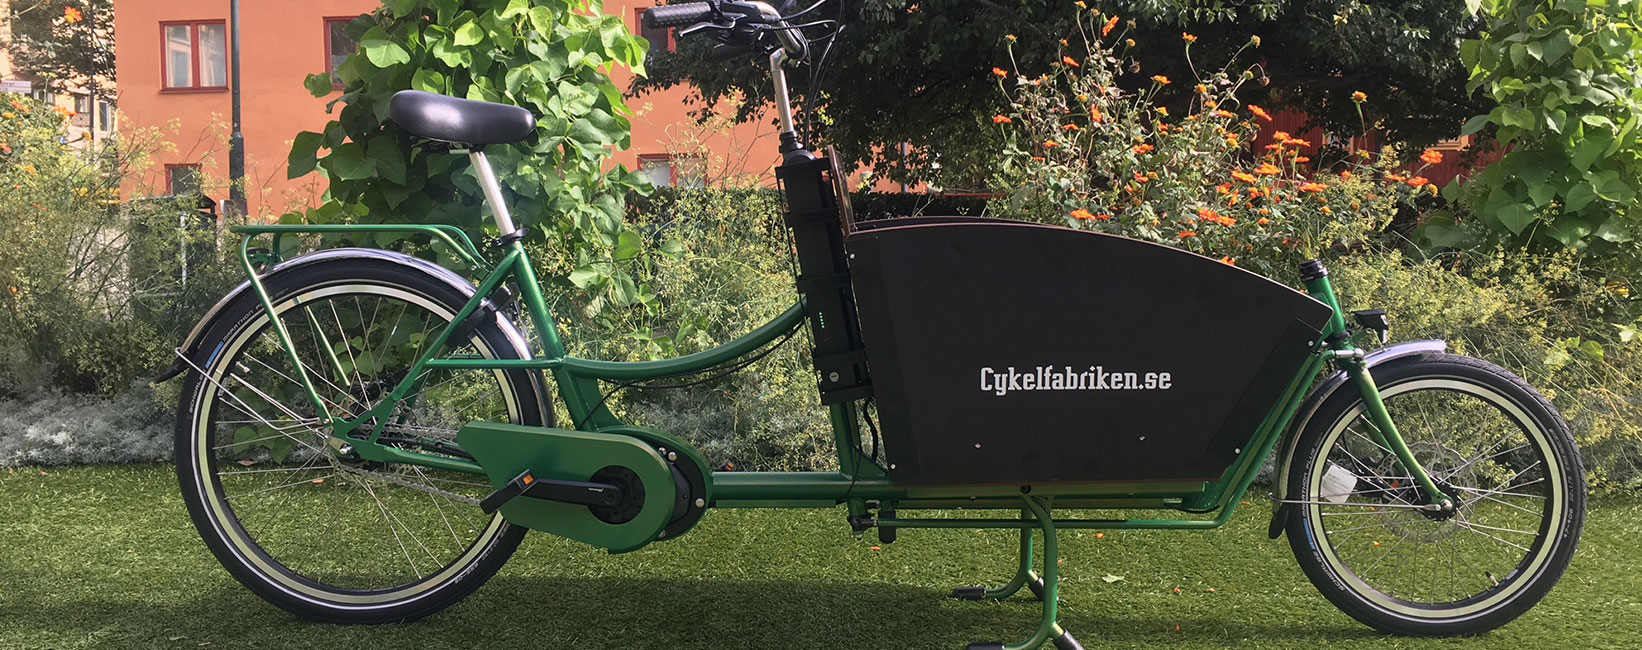 Cykelfabriken-Bakfiets-kort-Grön-3